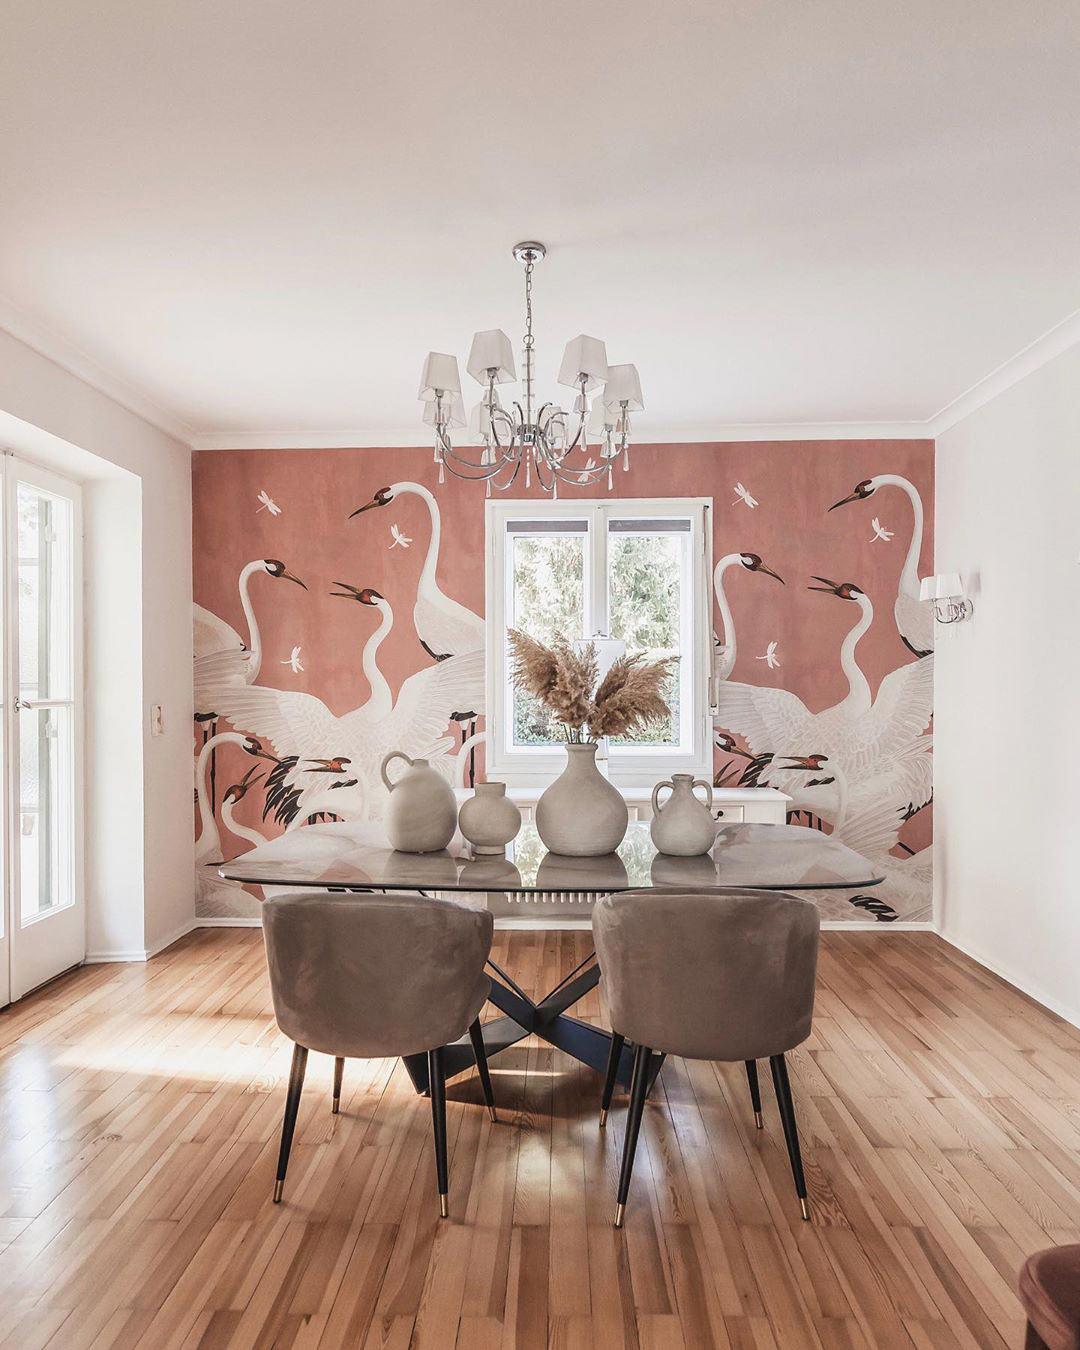 katarina-fischer-interior-gucci-decor